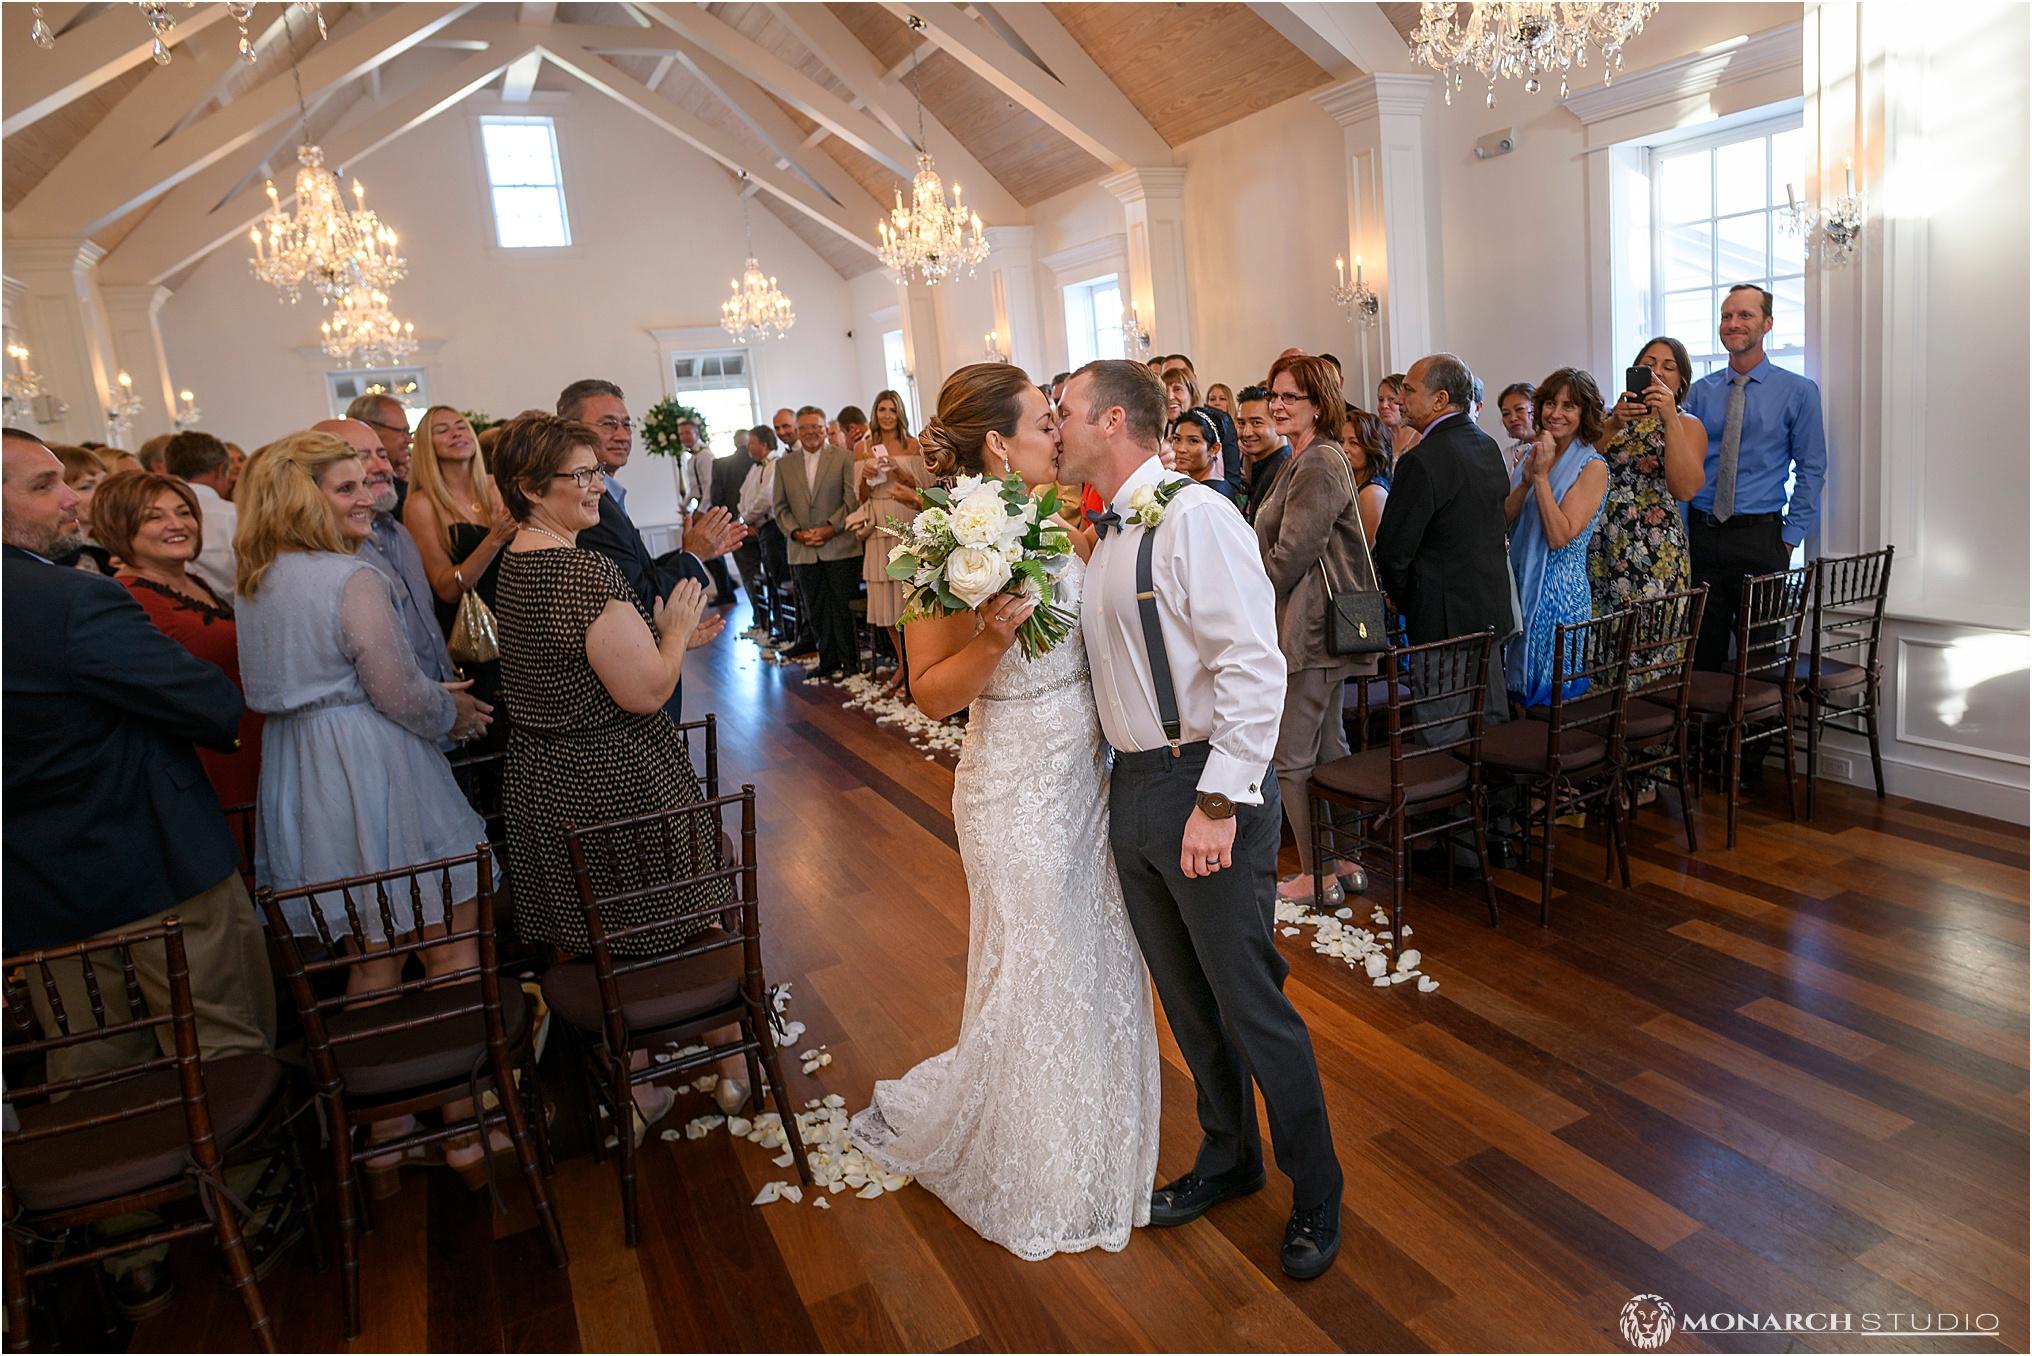 077-whiteroom-wedding-photographer-2019-05-22_0059.jpg